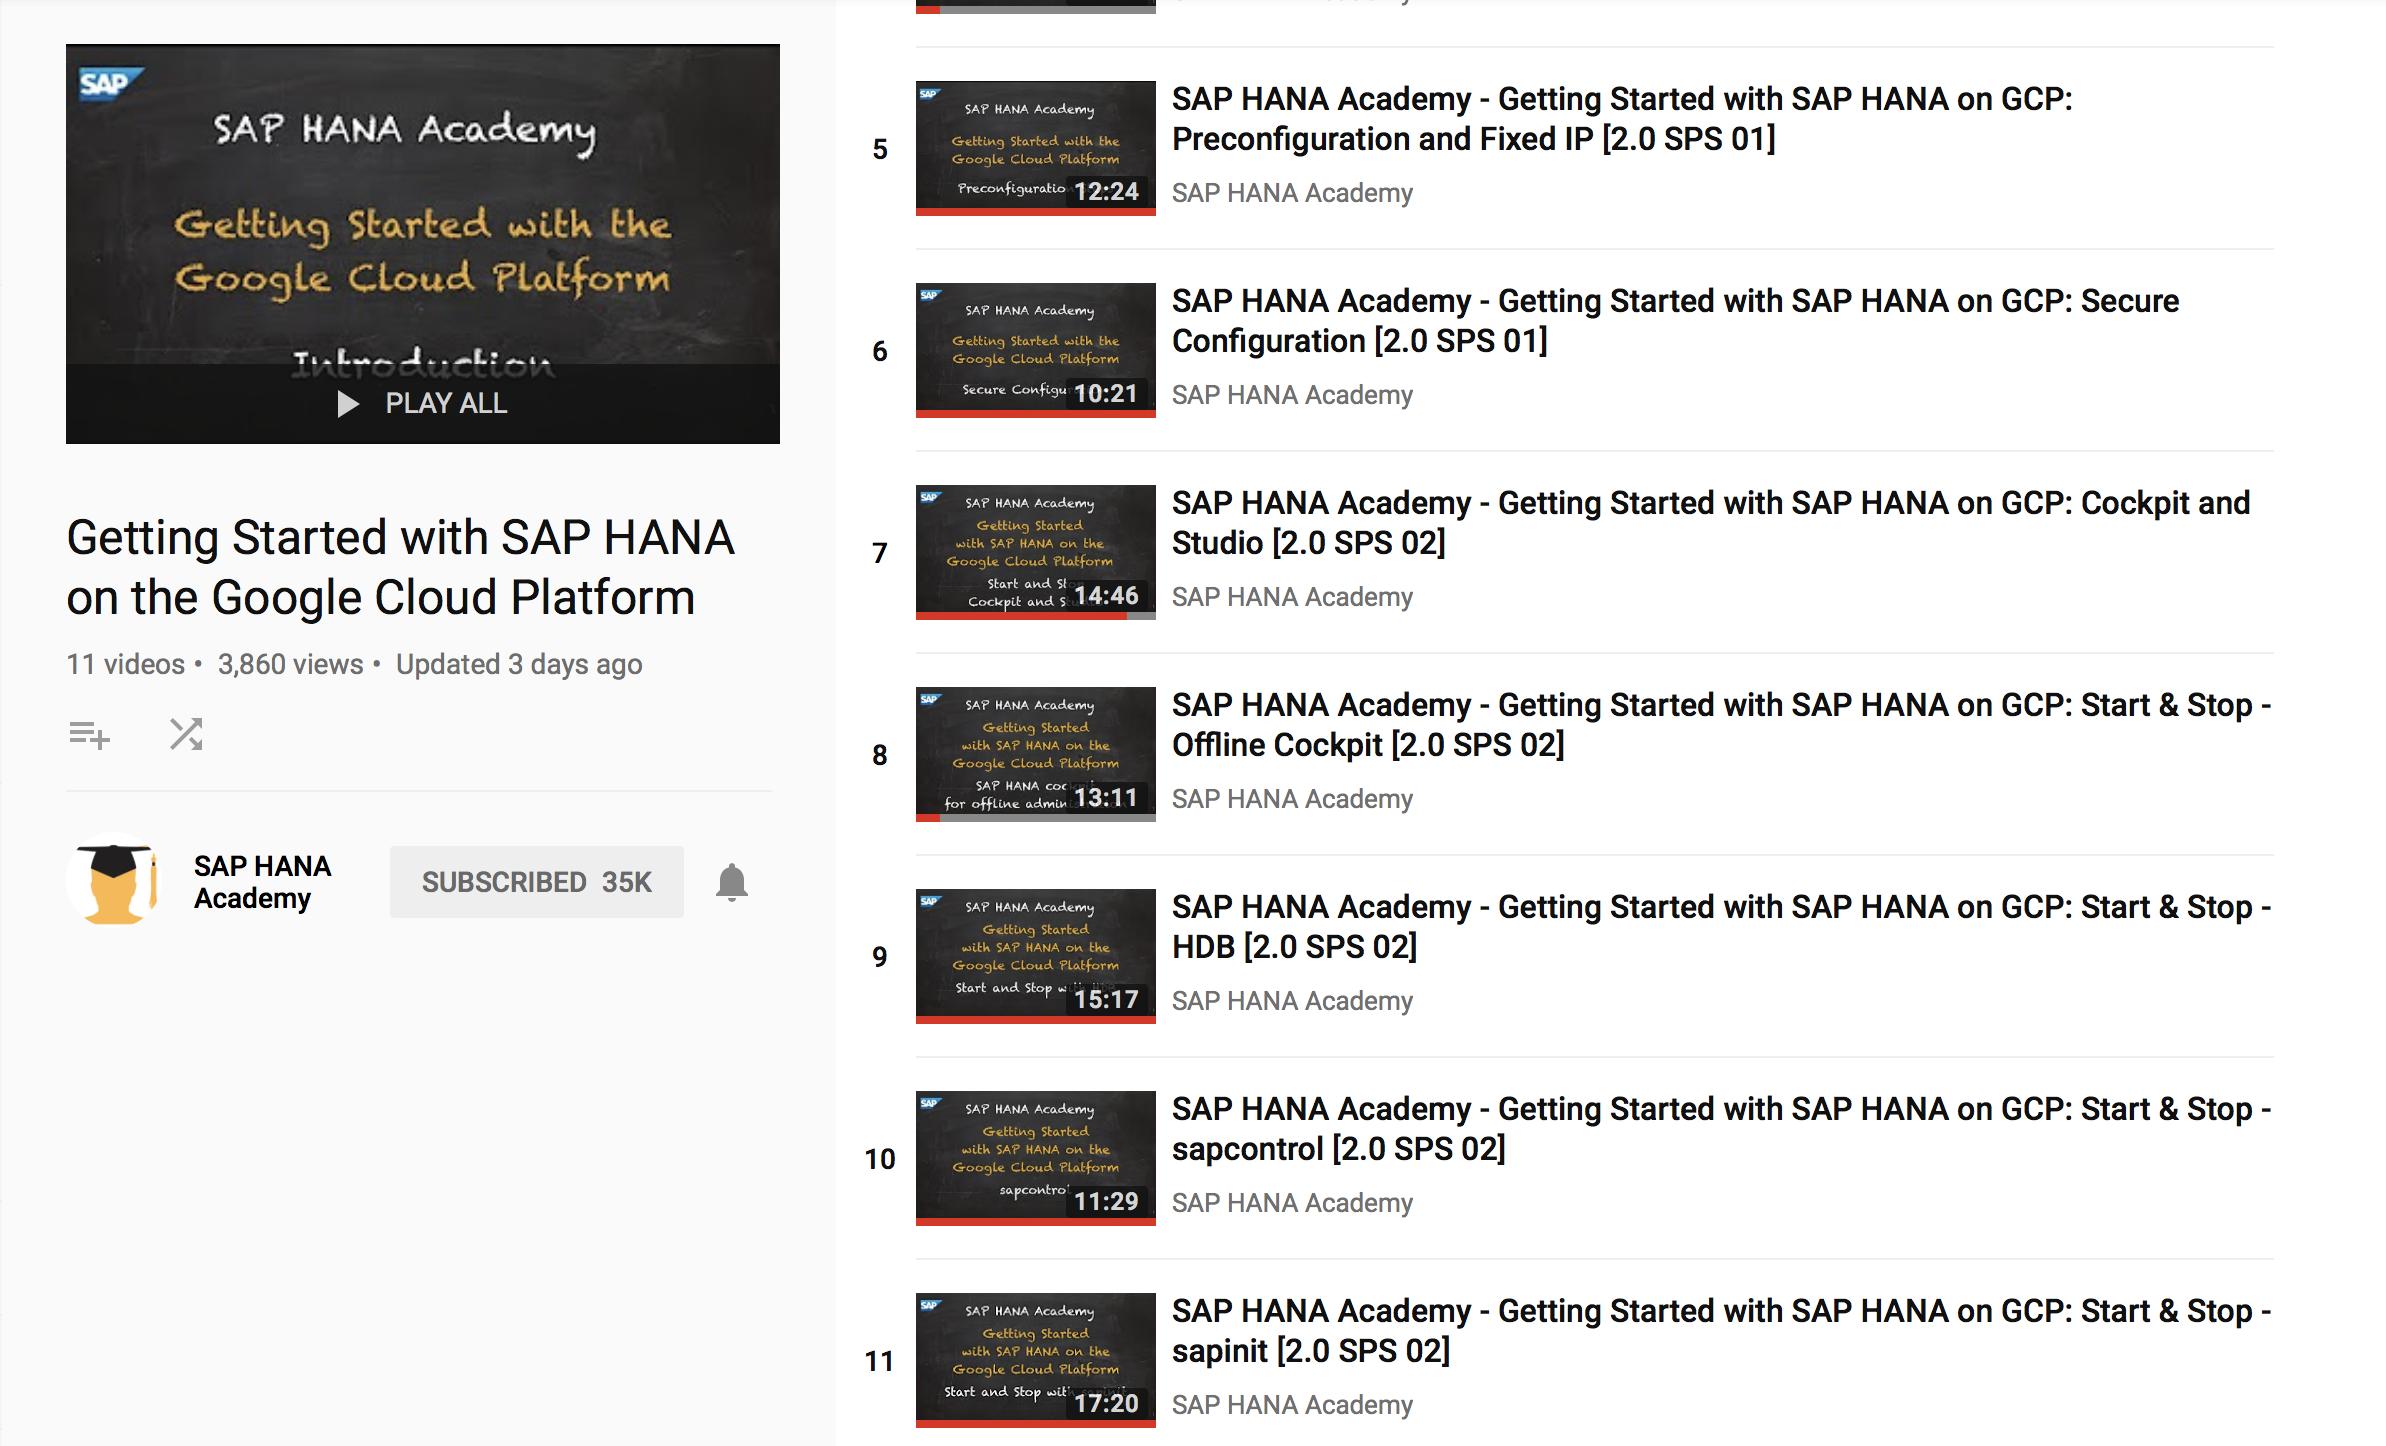 Start and Stop SAP HANA (on GCP) – by the SAP HANA Academy